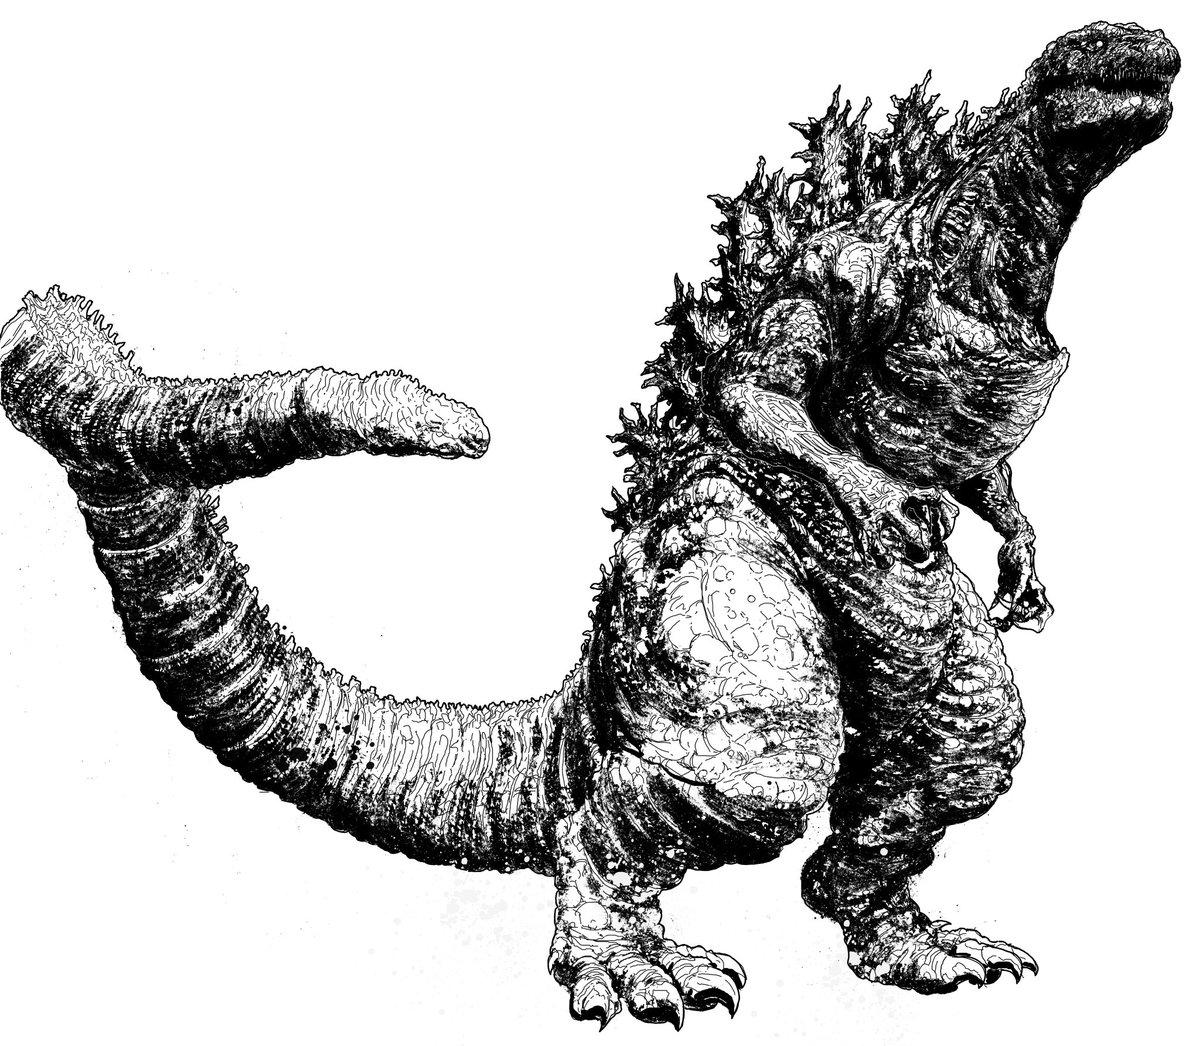 Godzilla. Yuge. instagram.com/p/CIDbD2oBtBt/…